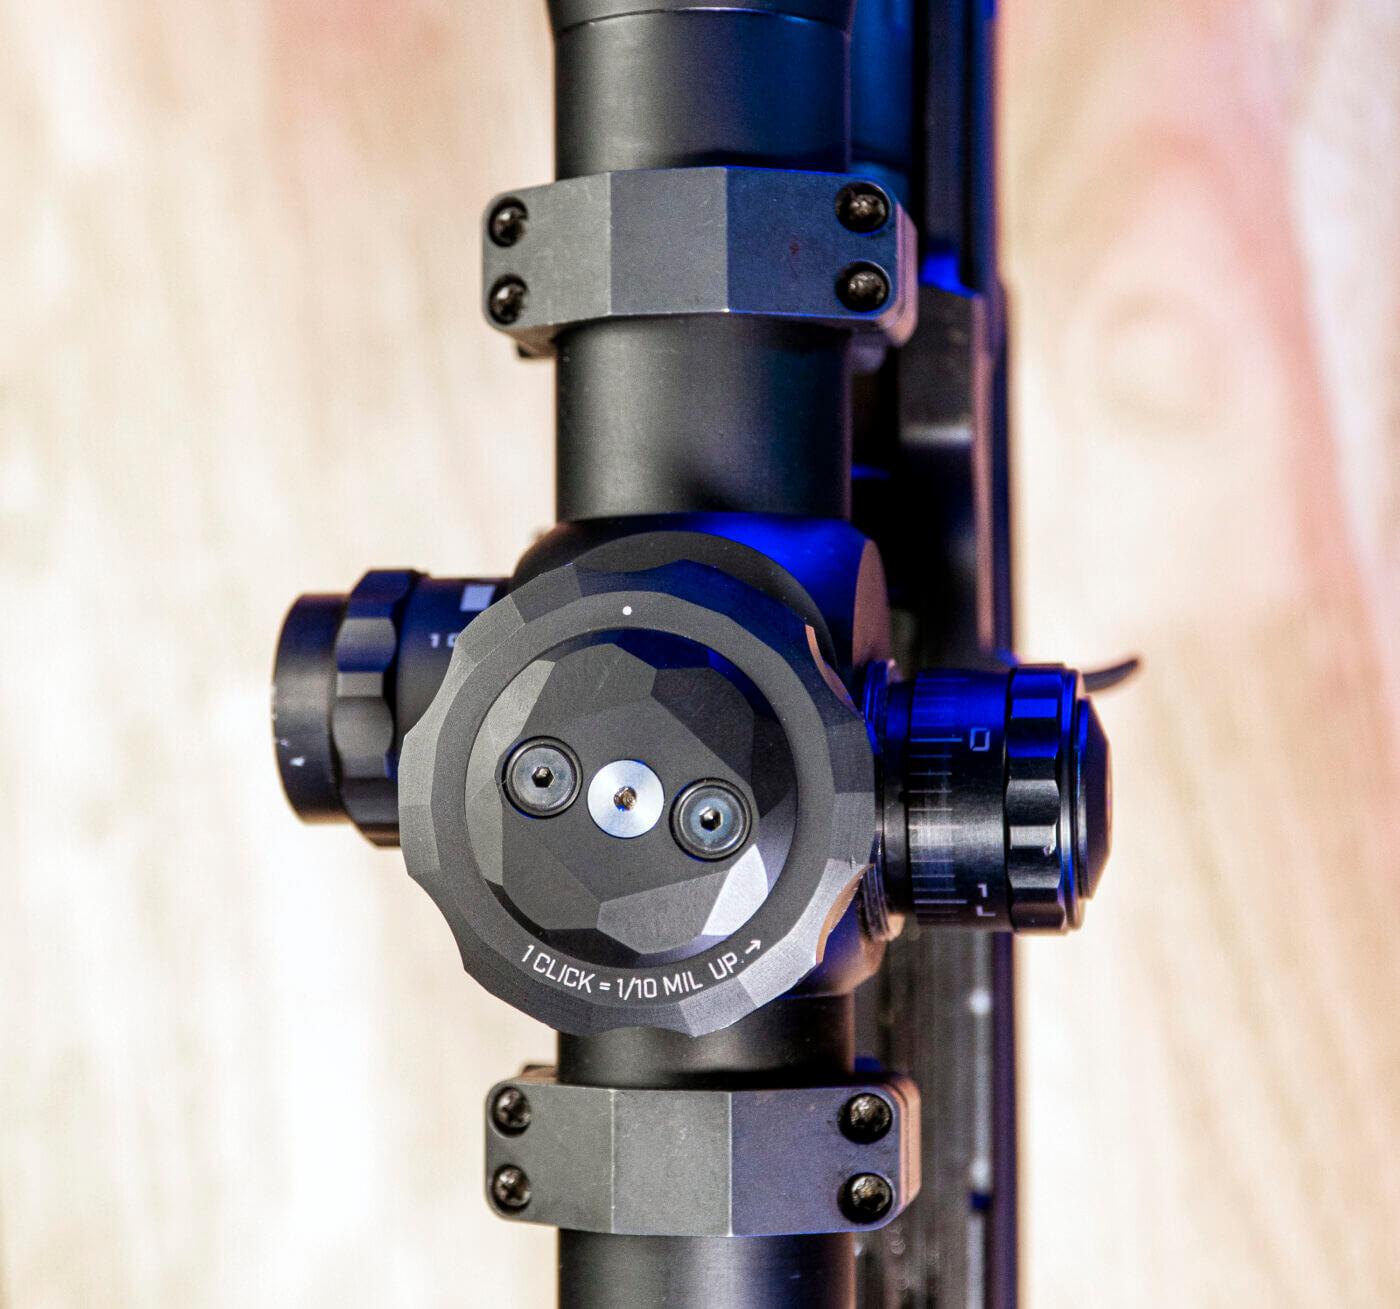 Elevation knob detail on FDN 25X scope